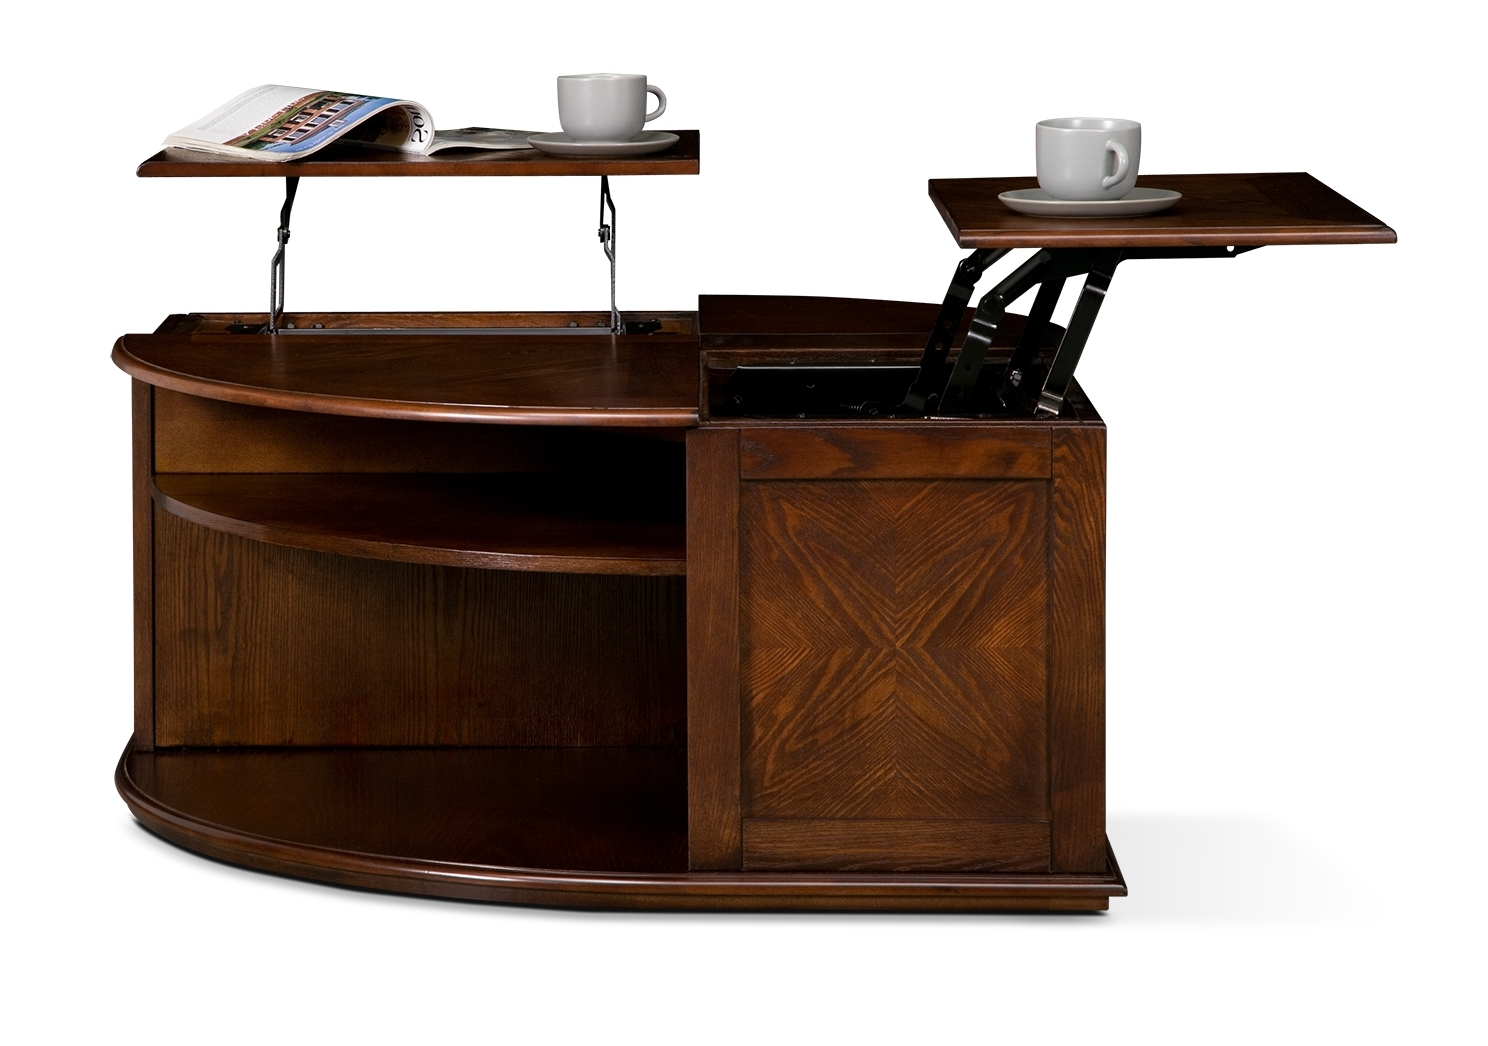 double lift top coffee table in regal walnut